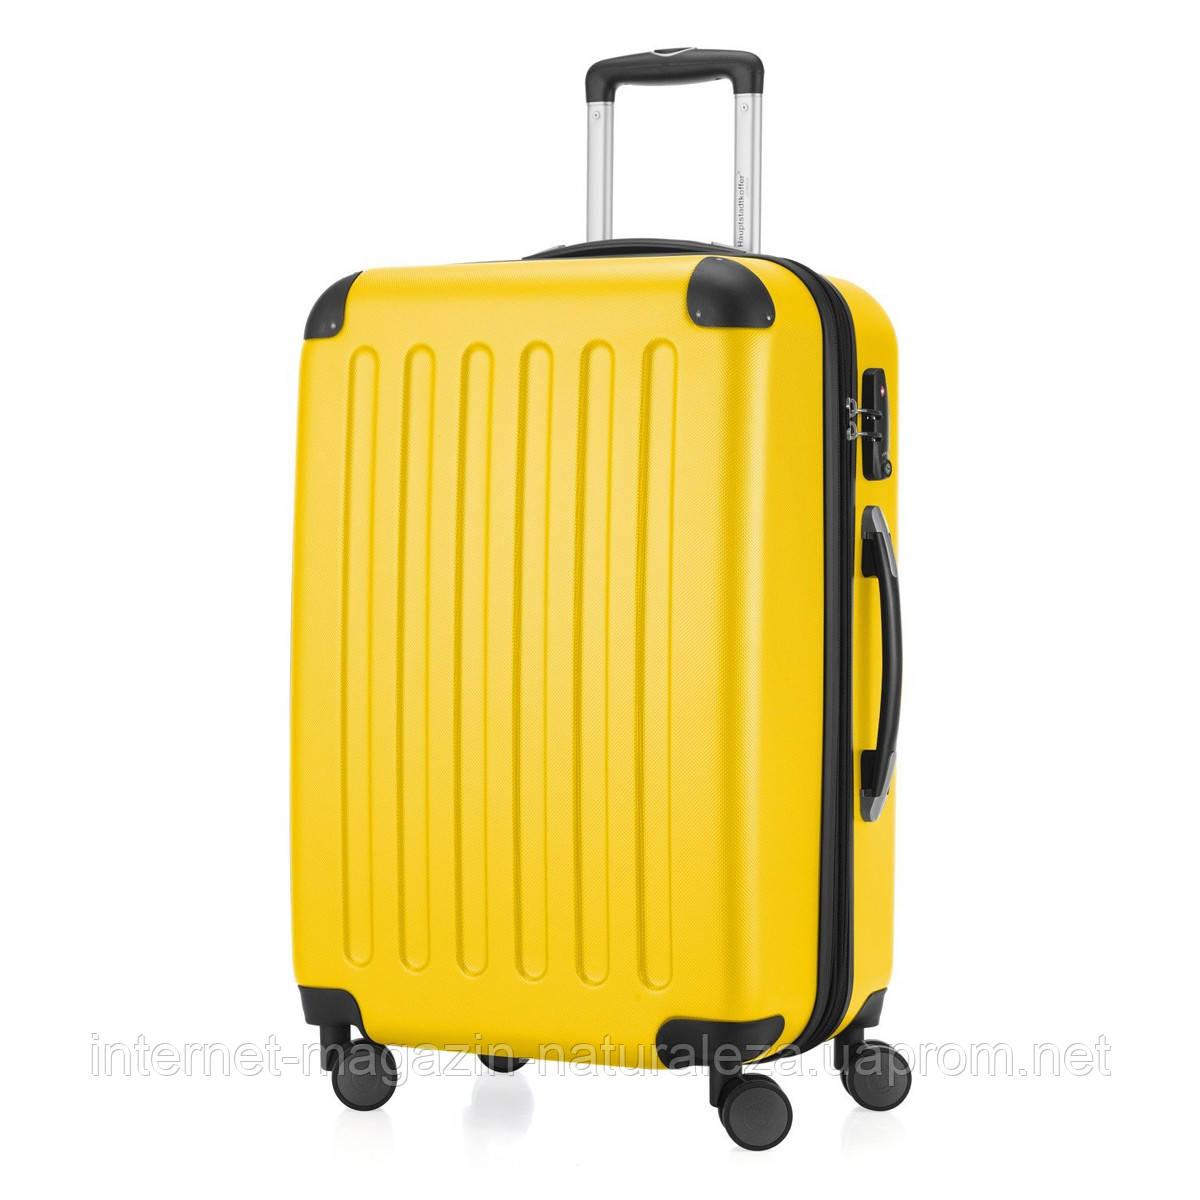 Дорожній чемодан Hauptstadtkoffer Spree Midi жовтий